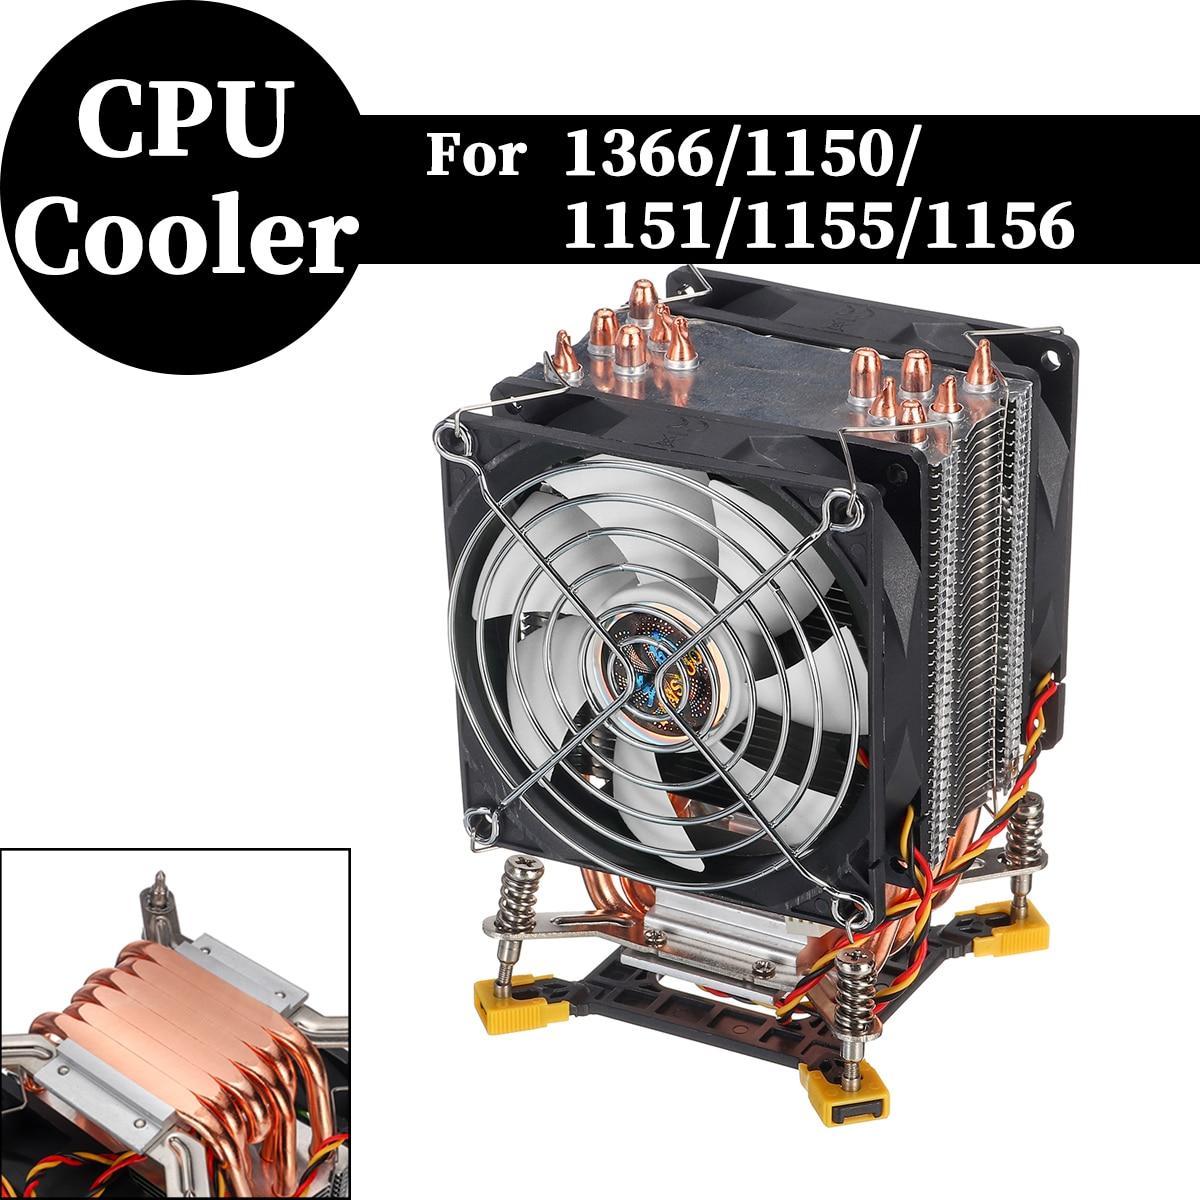 Disipador de calor de 90mm, 6 tuberías de calor de cobre, disipador de calor de CPU, ventiladores silenciosos, disipador de calor de refrigeración para Intel 1366/1155 con red de hierro